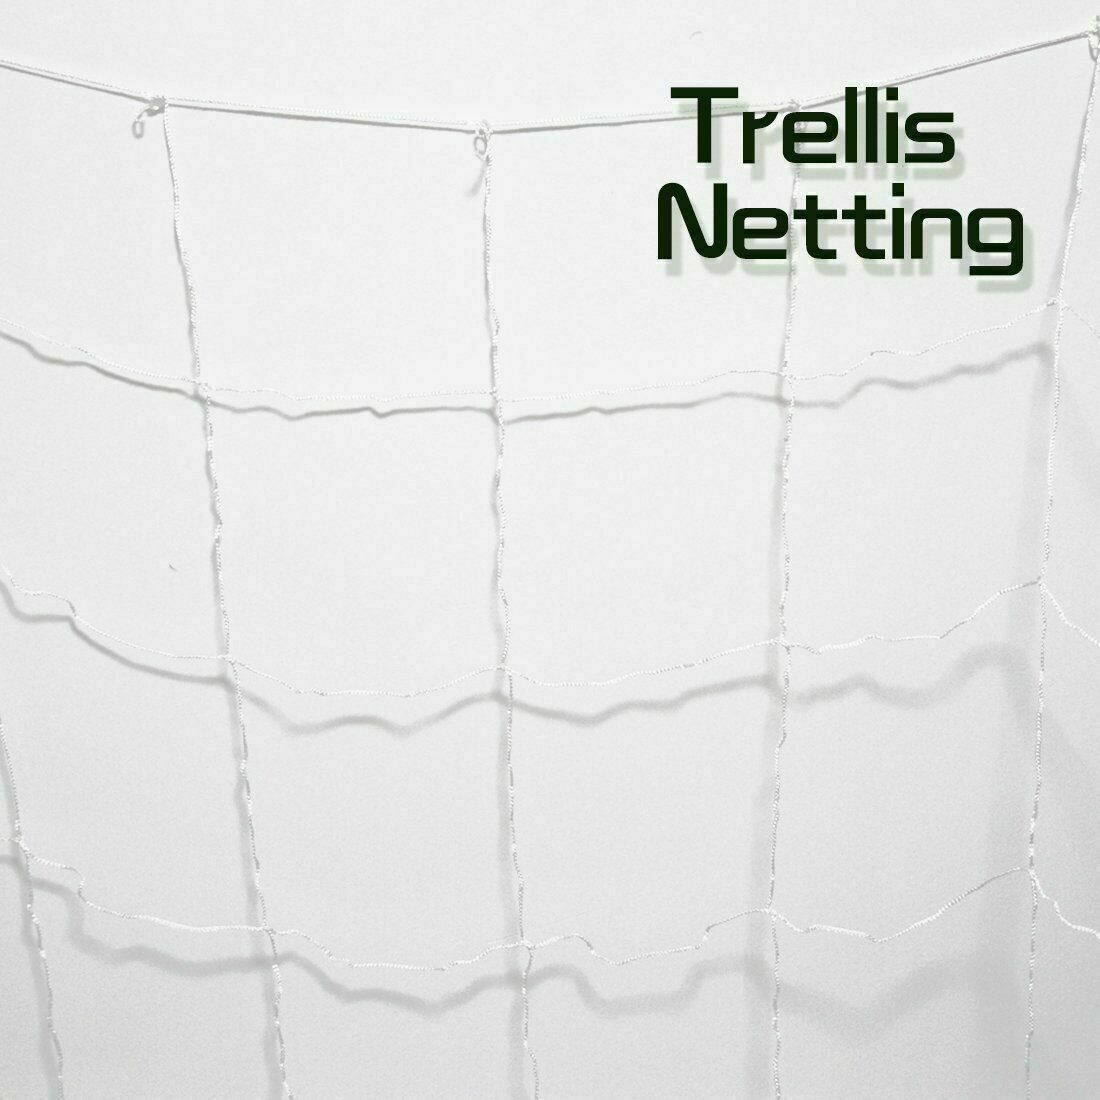 Digital Grow Trellis Netting